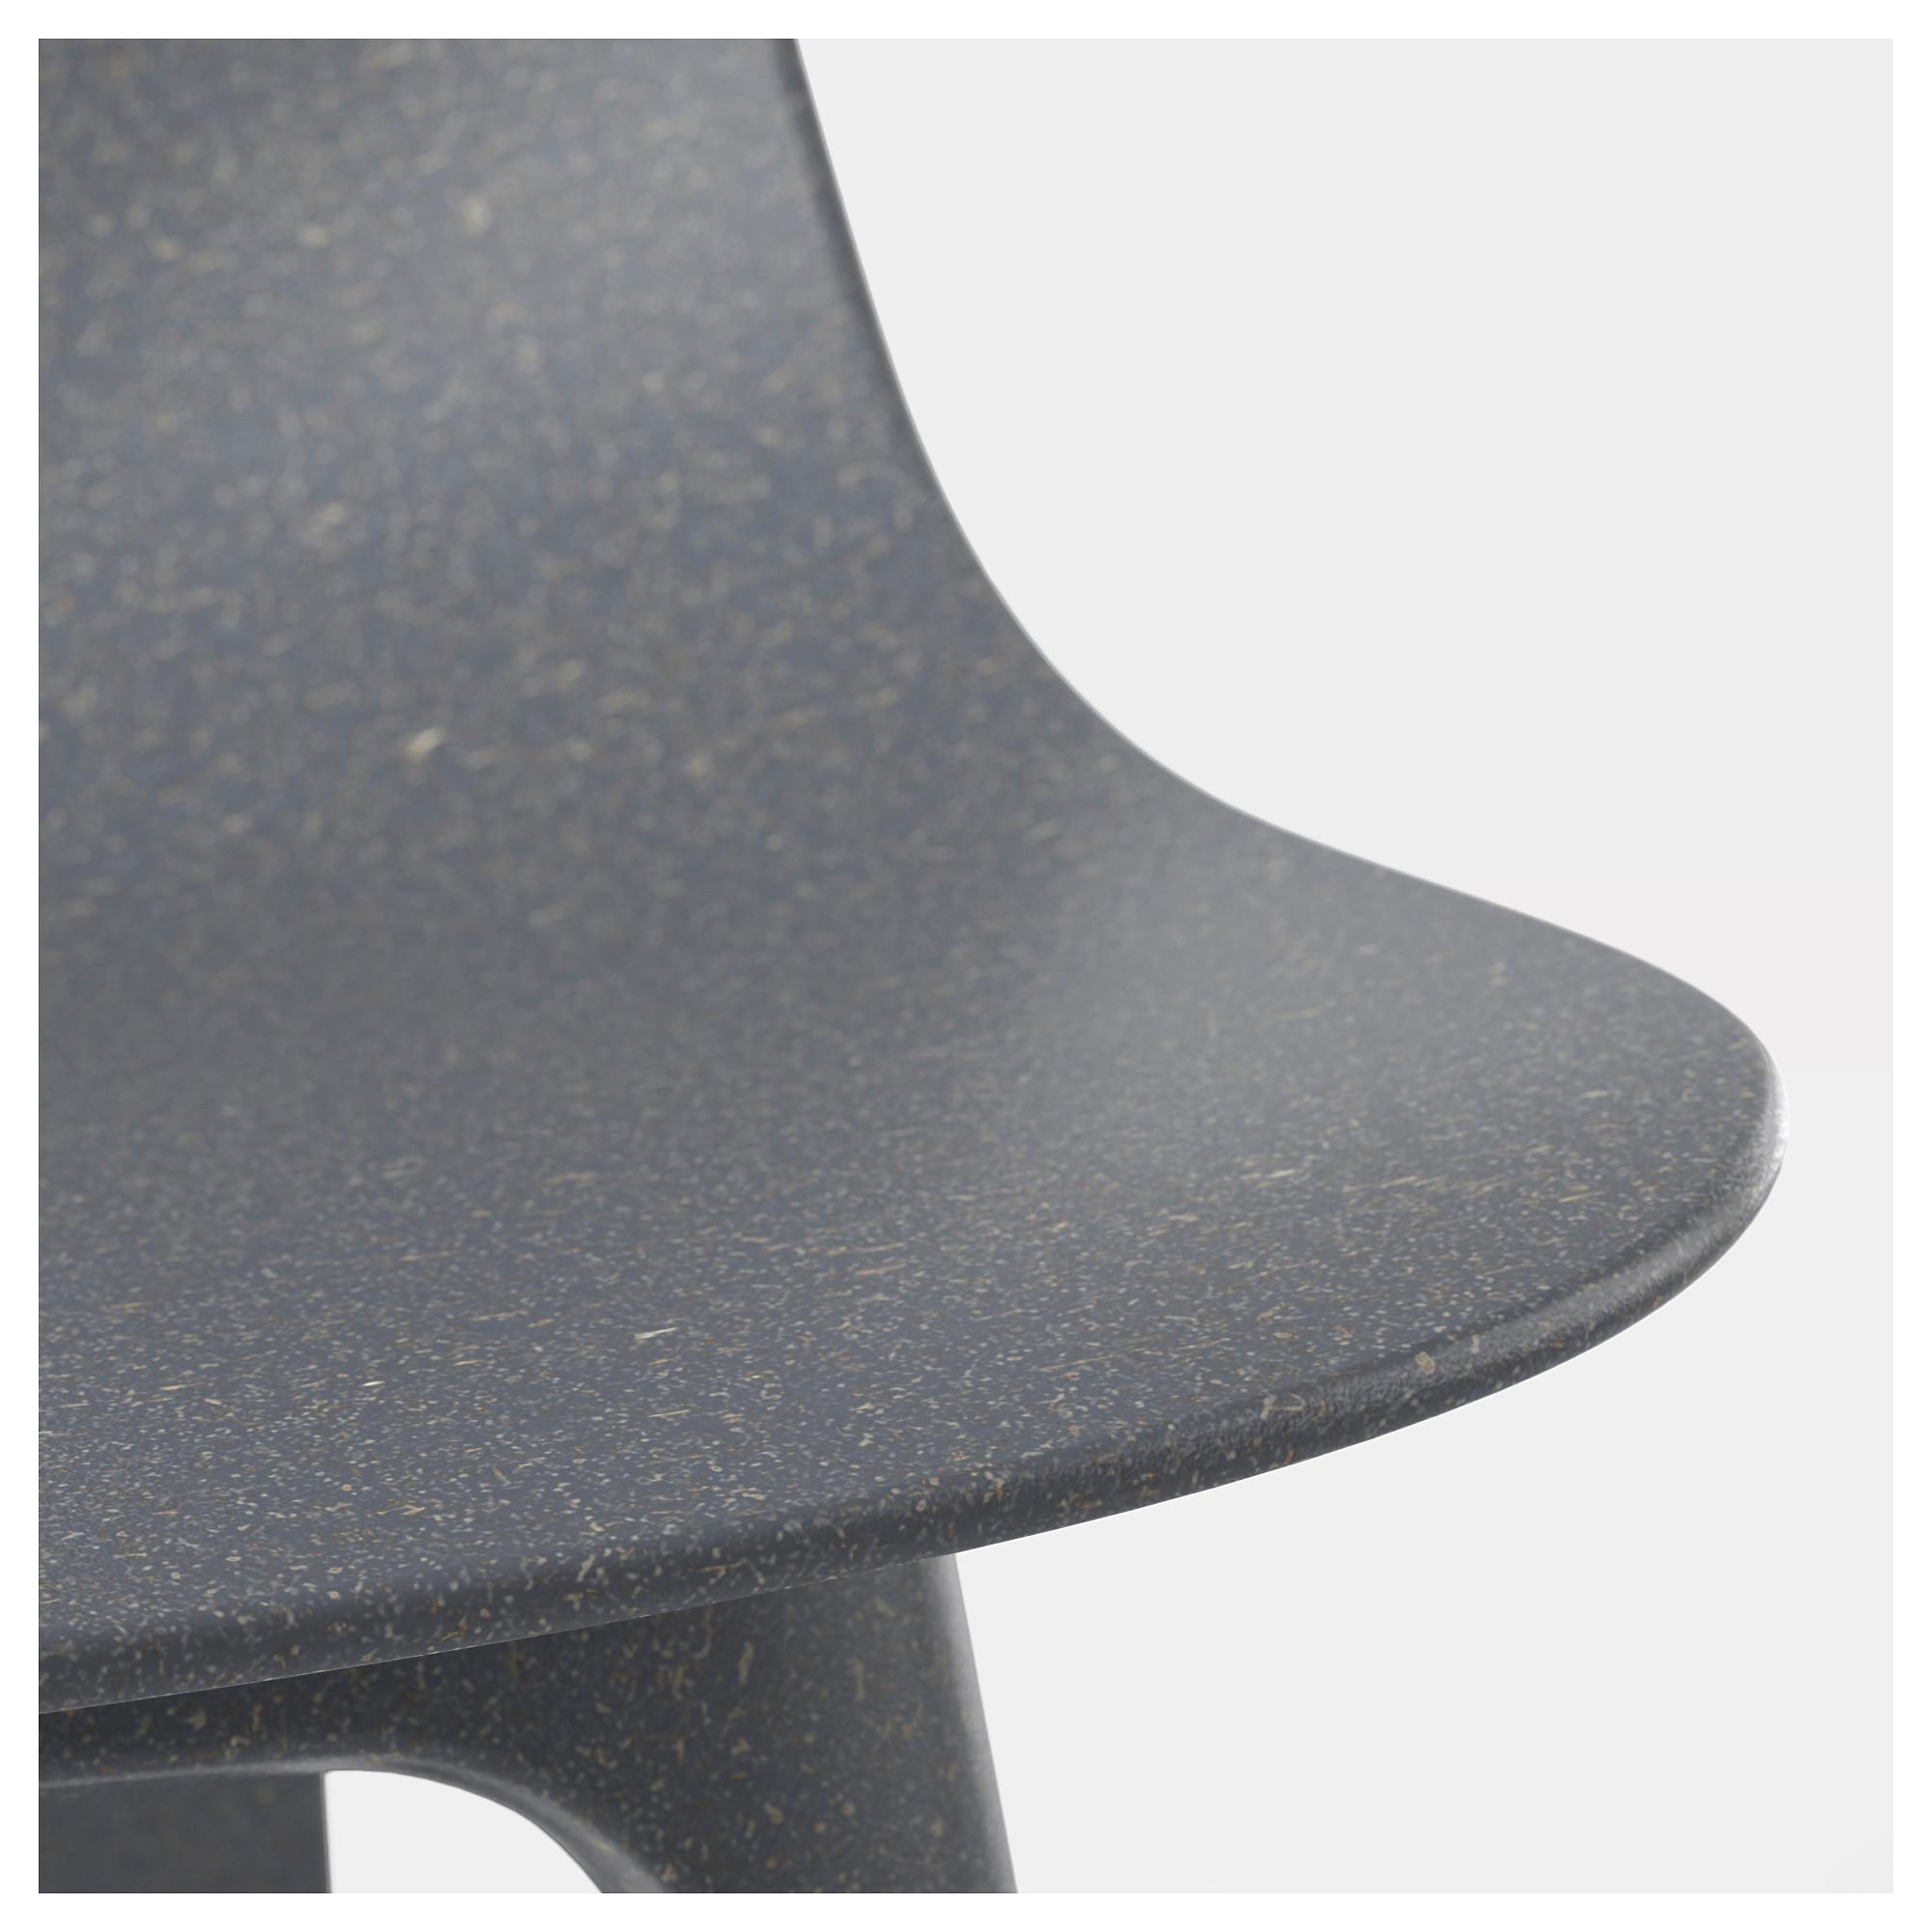 Groovy Table And 4 Chairs Ekedalen Odger White Blue Design Inzonedesignstudio Interior Chair Design Inzonedesignstudiocom